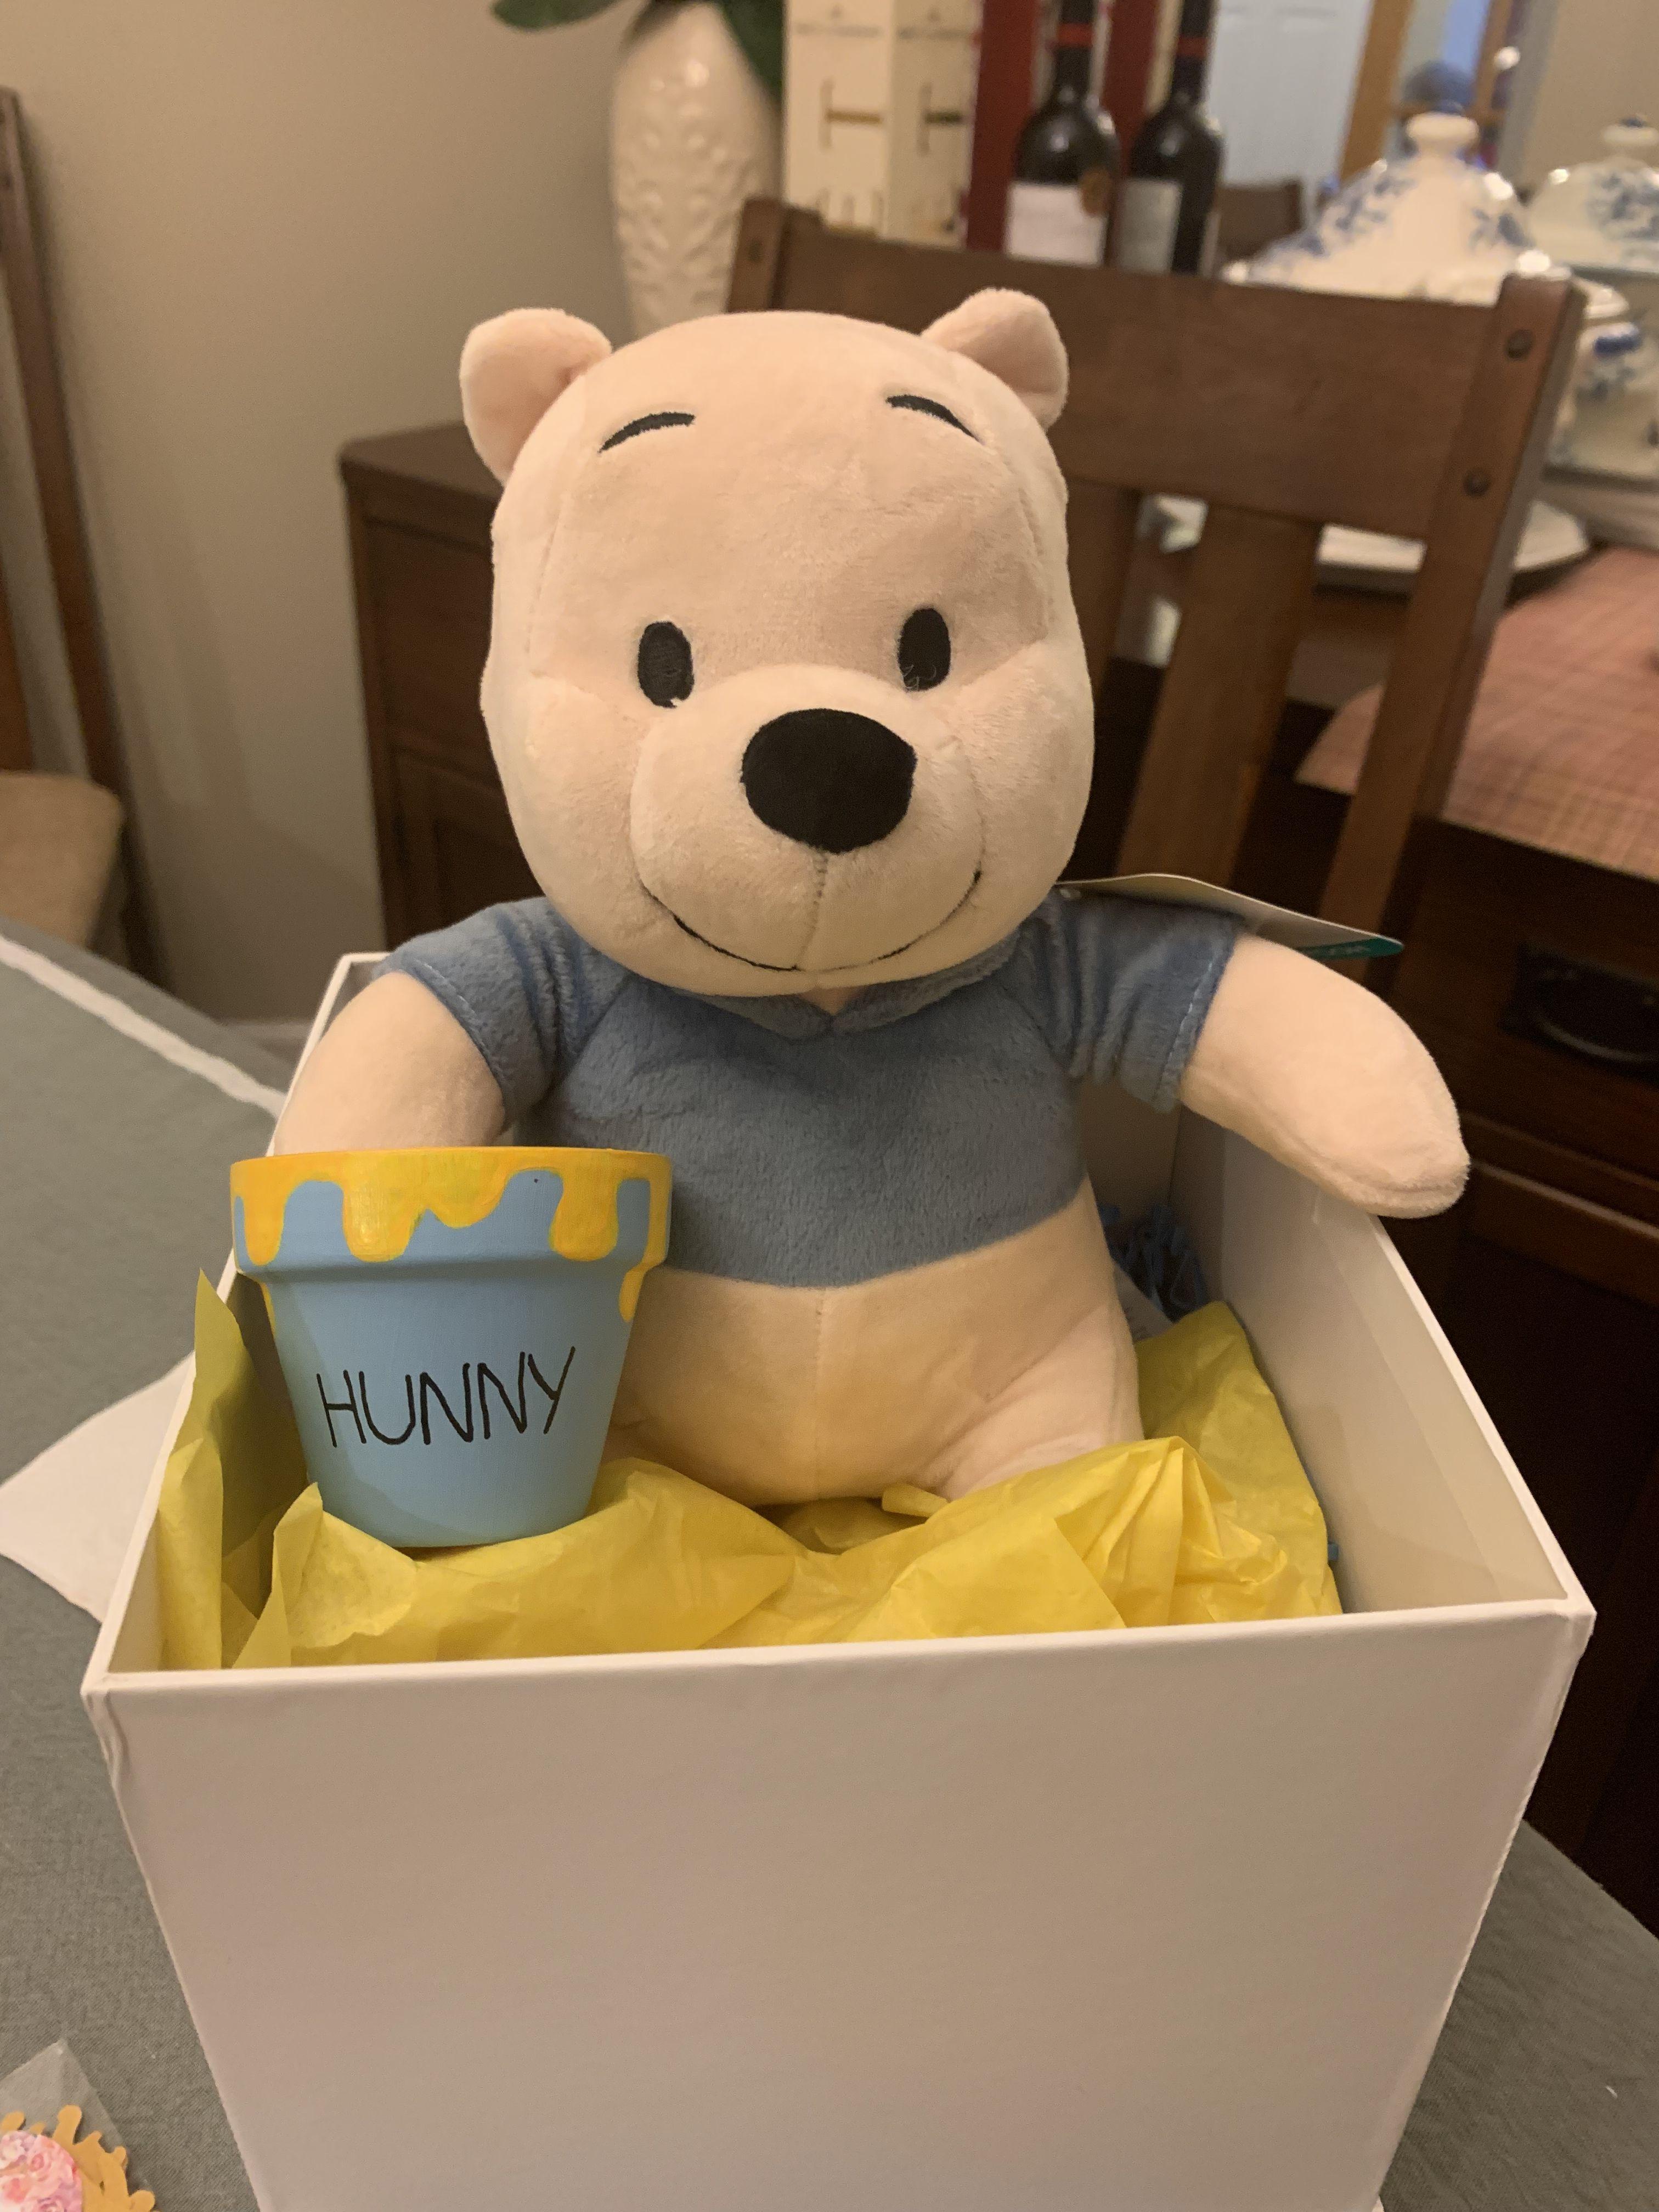 Winnie The Pooh Plush From Lambs Ivy Hunny Pot From Etsy Winnie The Pooh Nursery Winnie The Pooh Plush Lambs Ivy